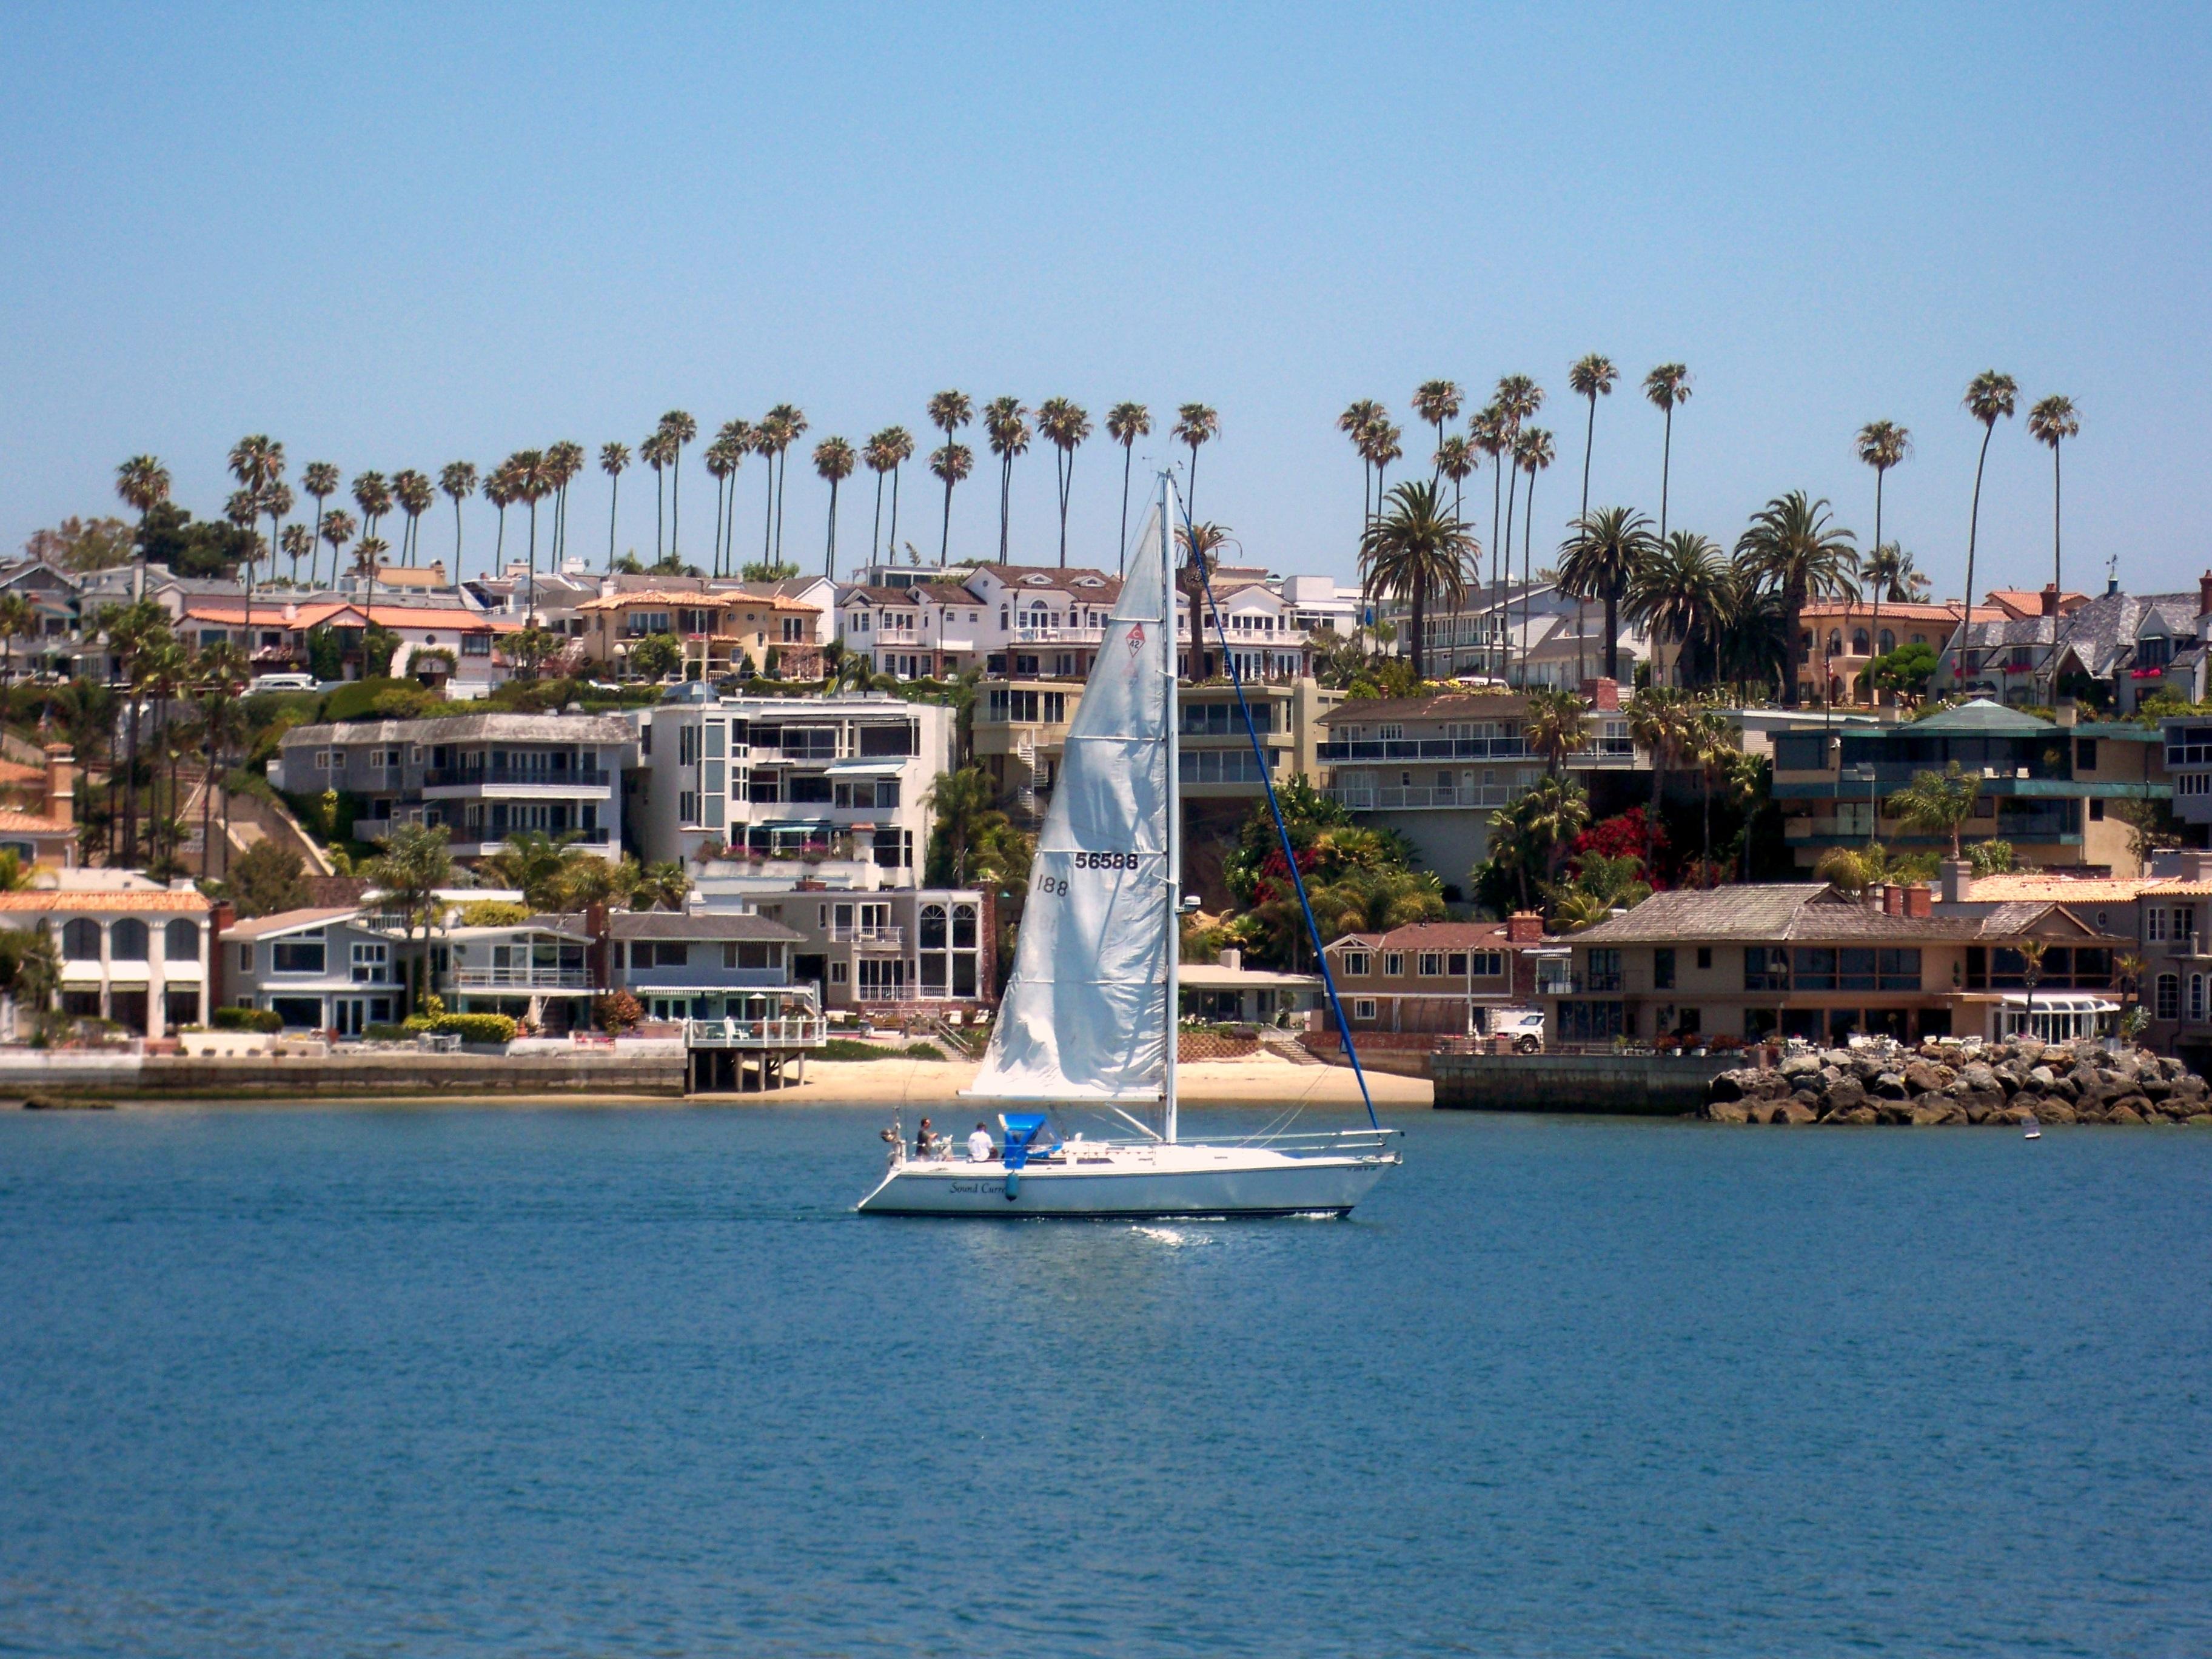 Balboa Island Newport Beach Weather